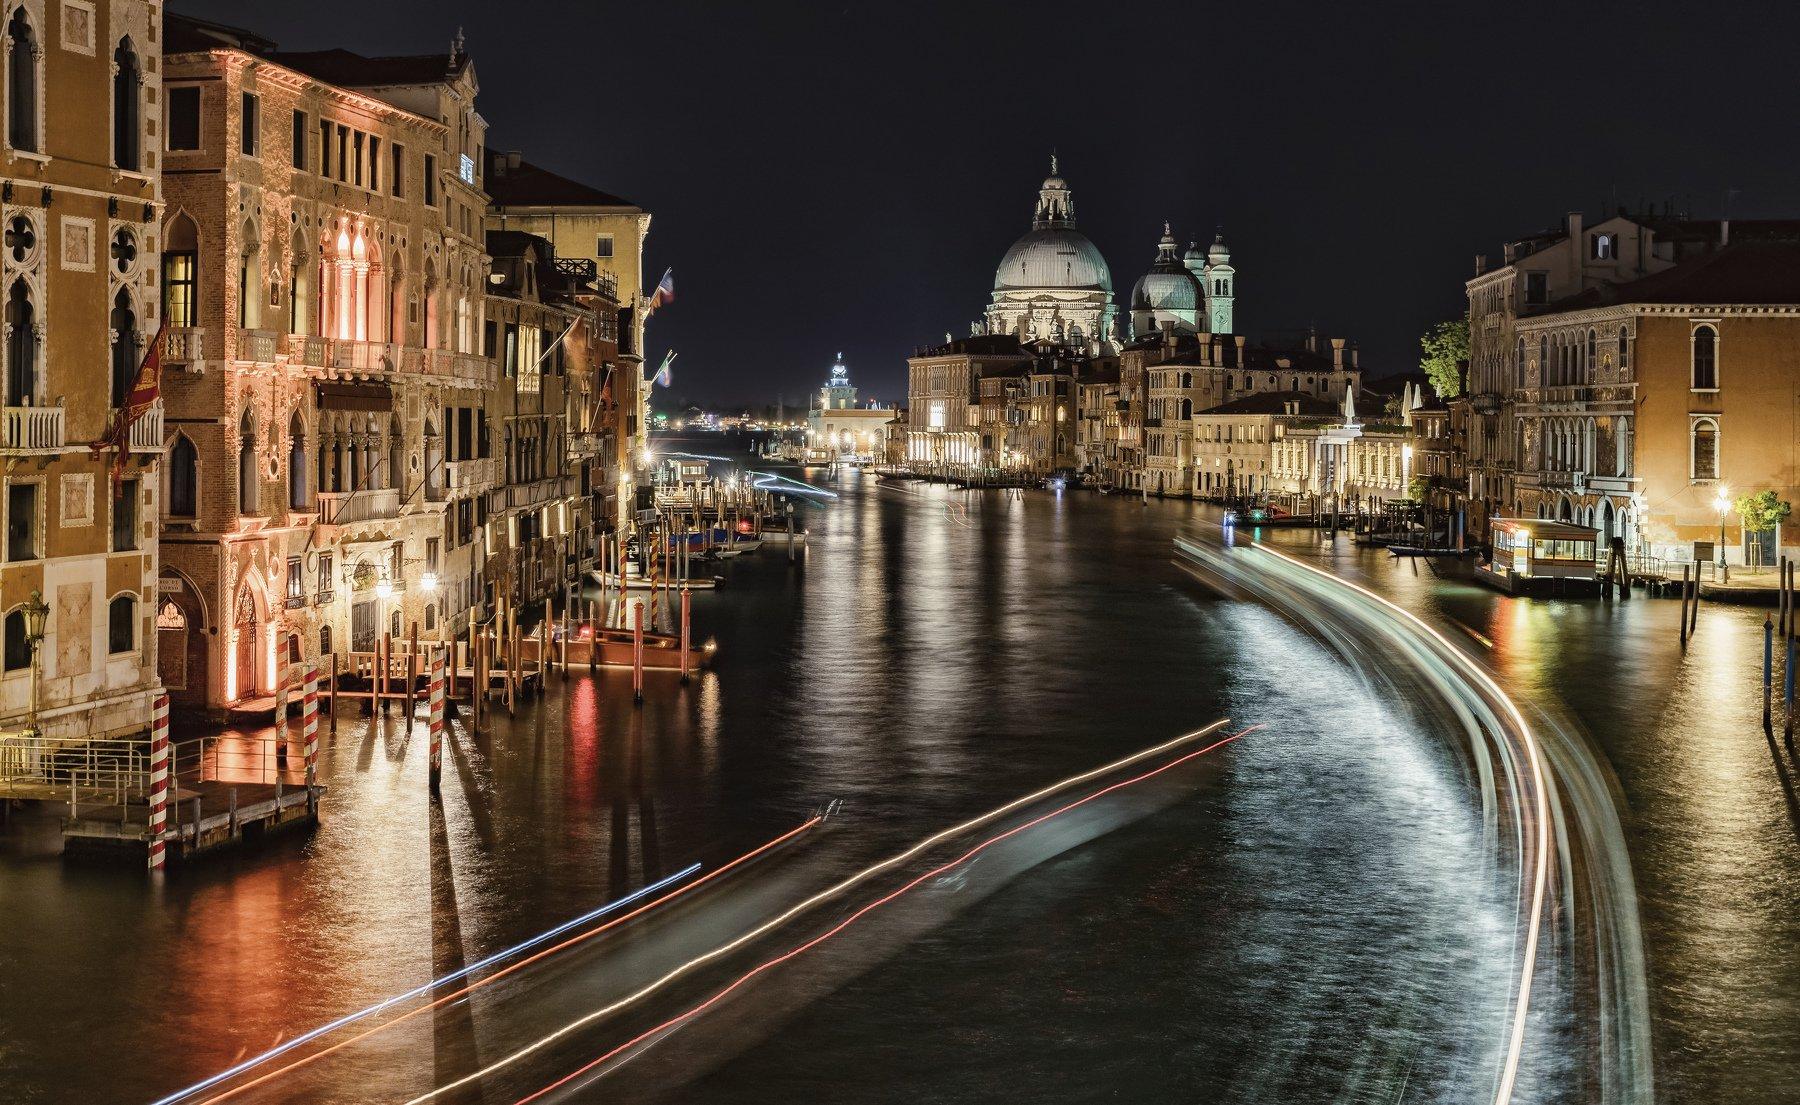 венеция, Италия, Alexandr Bezmolitvenny